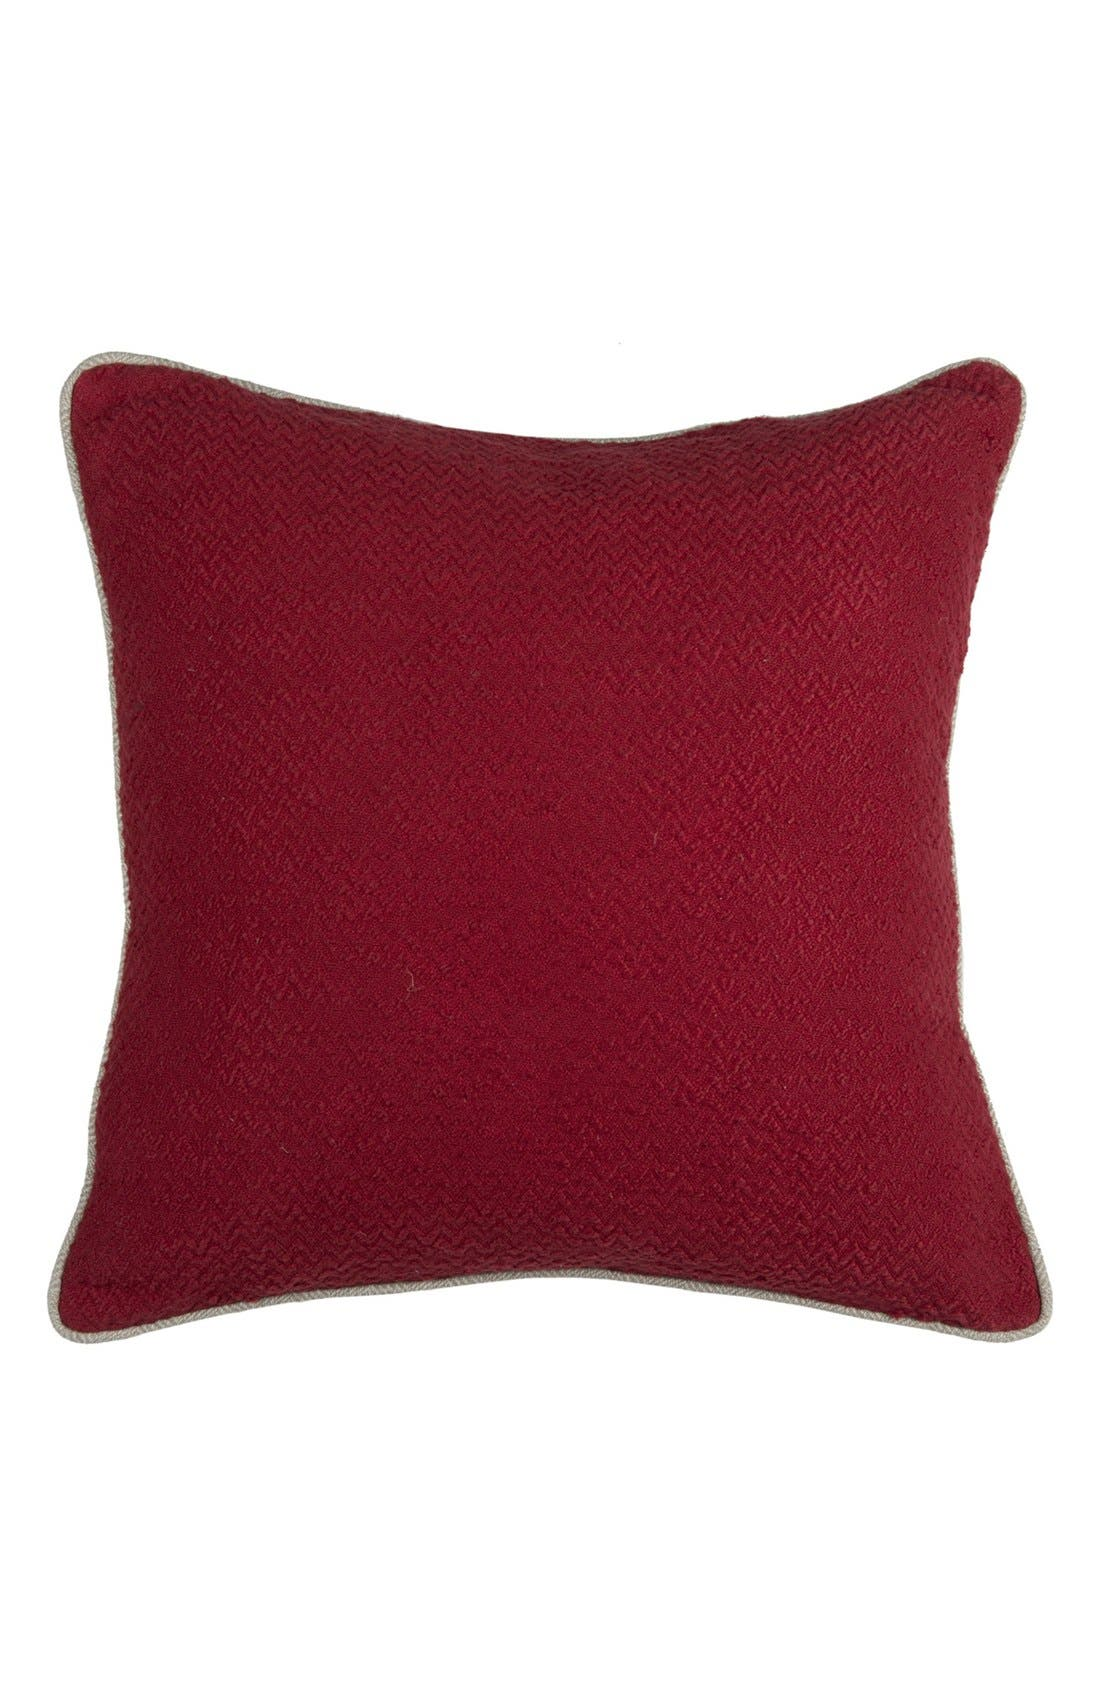 Main Image - Villa Home Collections 'Razia' Pillow